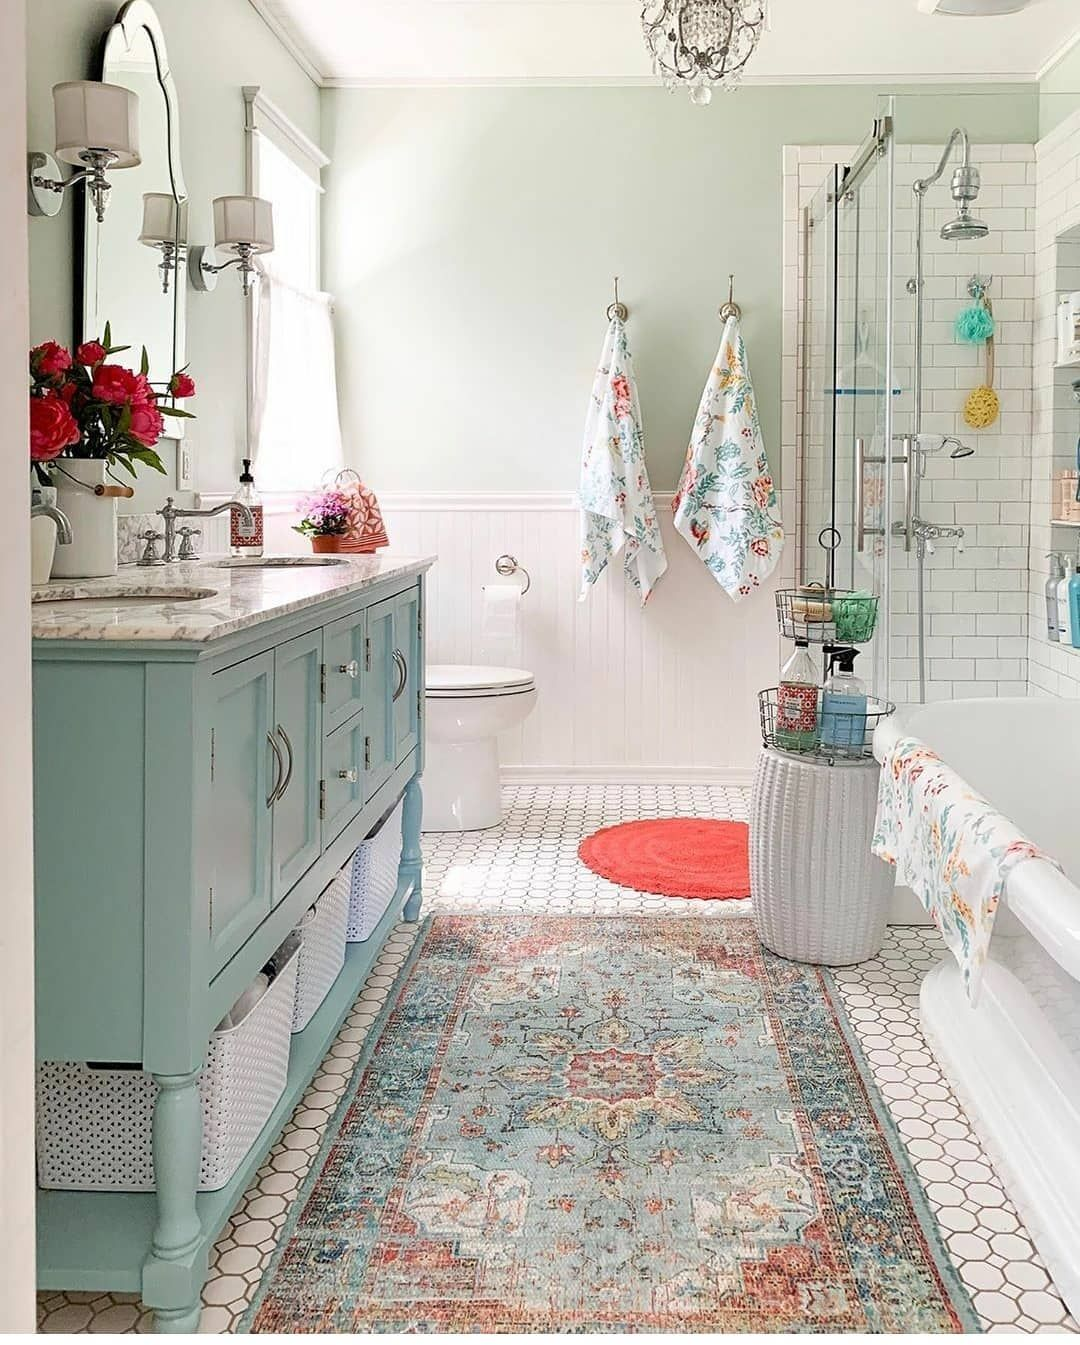 4 180 Likes 80 Comments Farmhouse Stylebook Farmhousestylebook On Instagram This Bathroom Is One Master Bathroom Decor Bathroom Rugs Vintage Tub Bath [ 1345 x 1080 Pixel ]